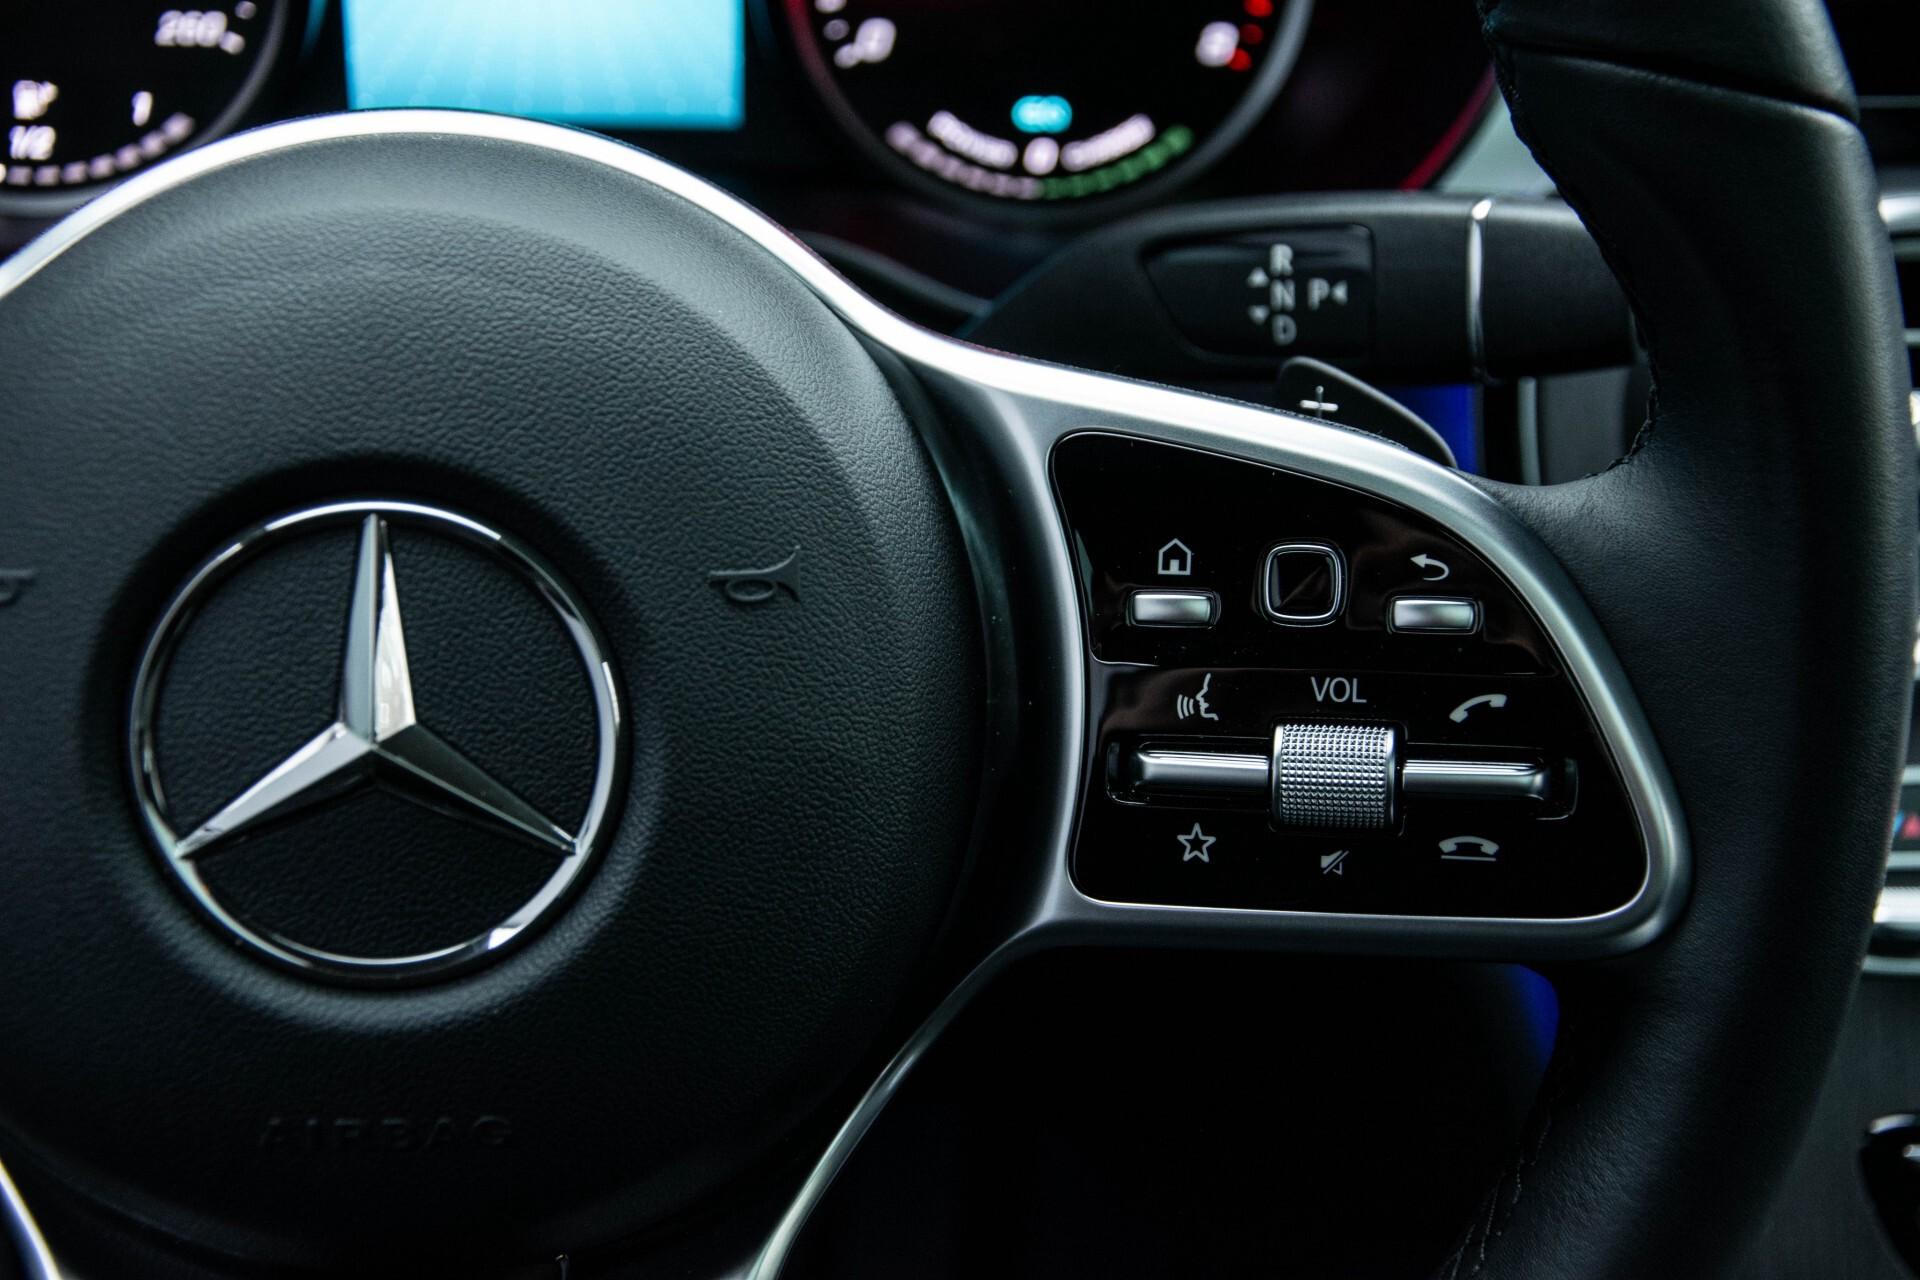 Mercedes-Benz GLC 200 4-M AMG Night/Panorama/Distronic Pro/Burmester/360camera/Exclusive Aut9 Foto 15